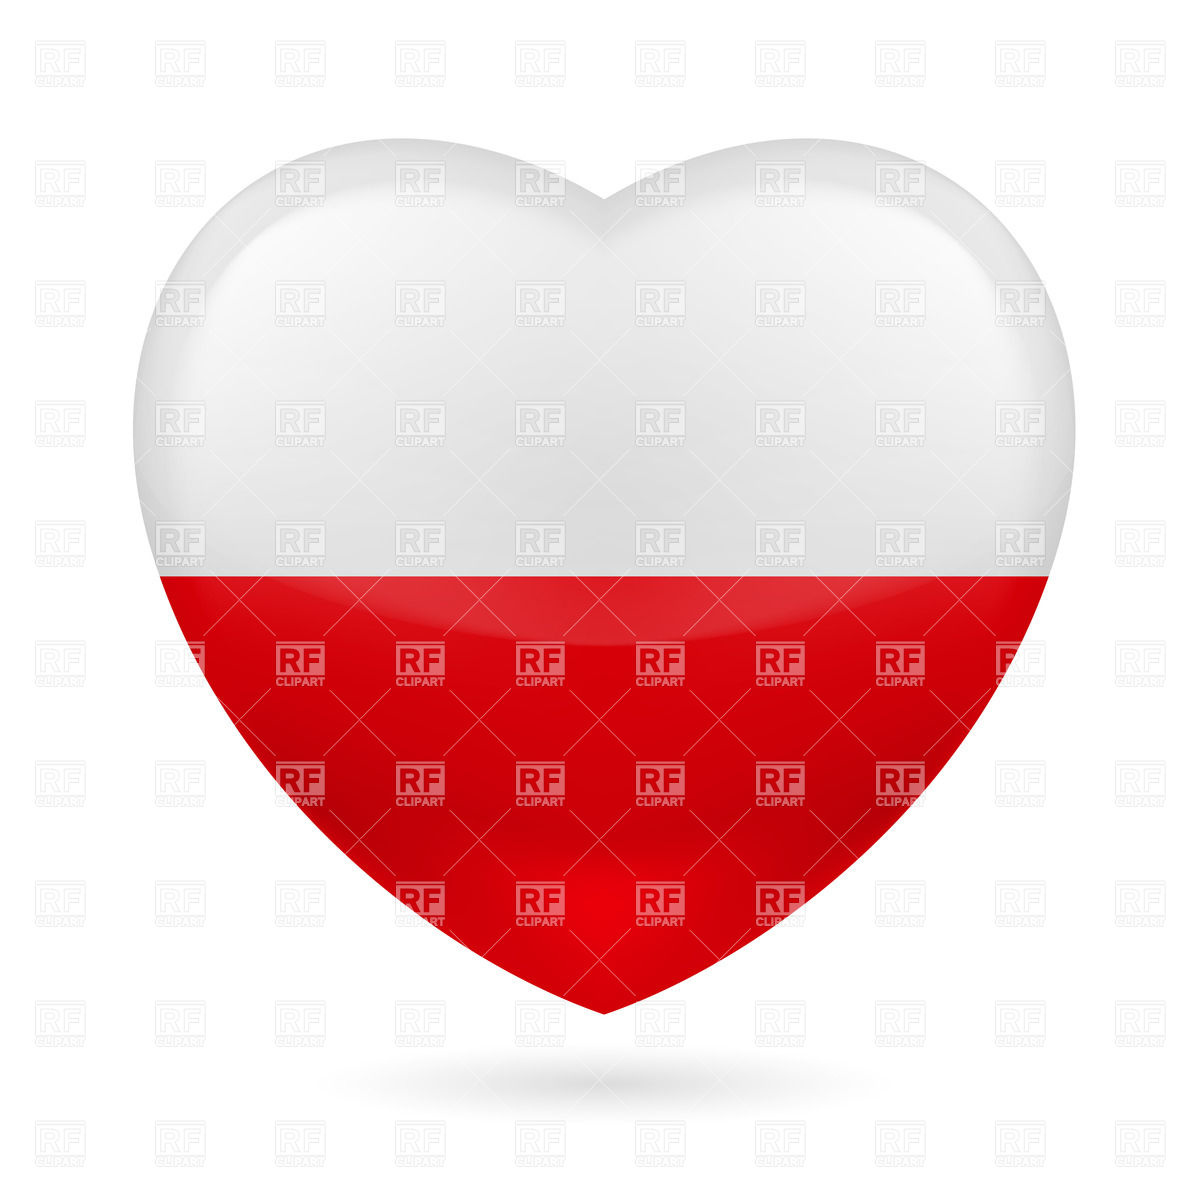 1200x1200 Heart With Polish Flag Colors. I Love Poland Royalty Free Vector